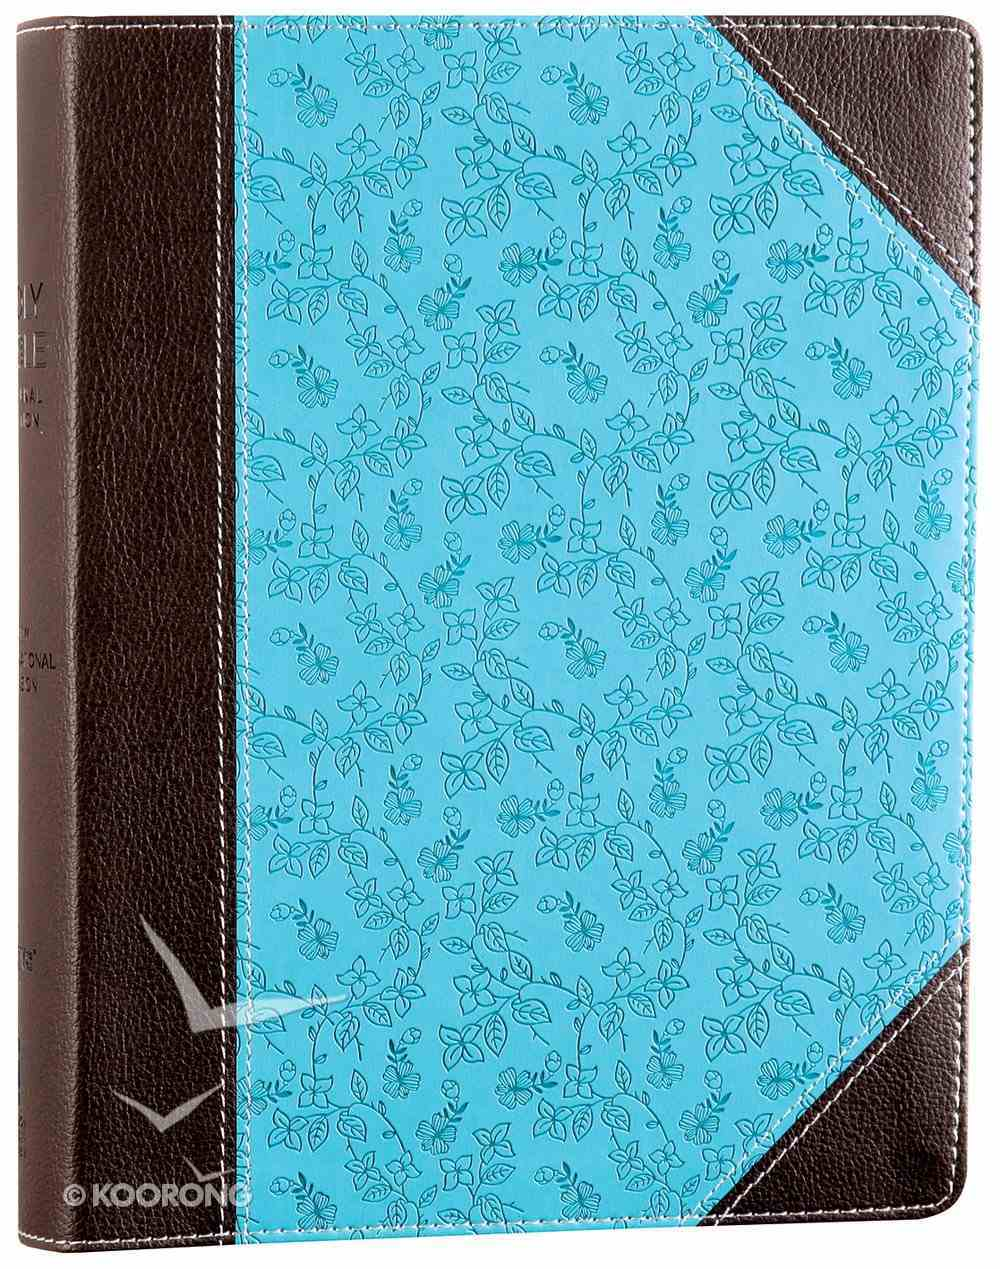 NIV Single-Column Journaling Bible Chocolate/Turquoise Imitation Leather